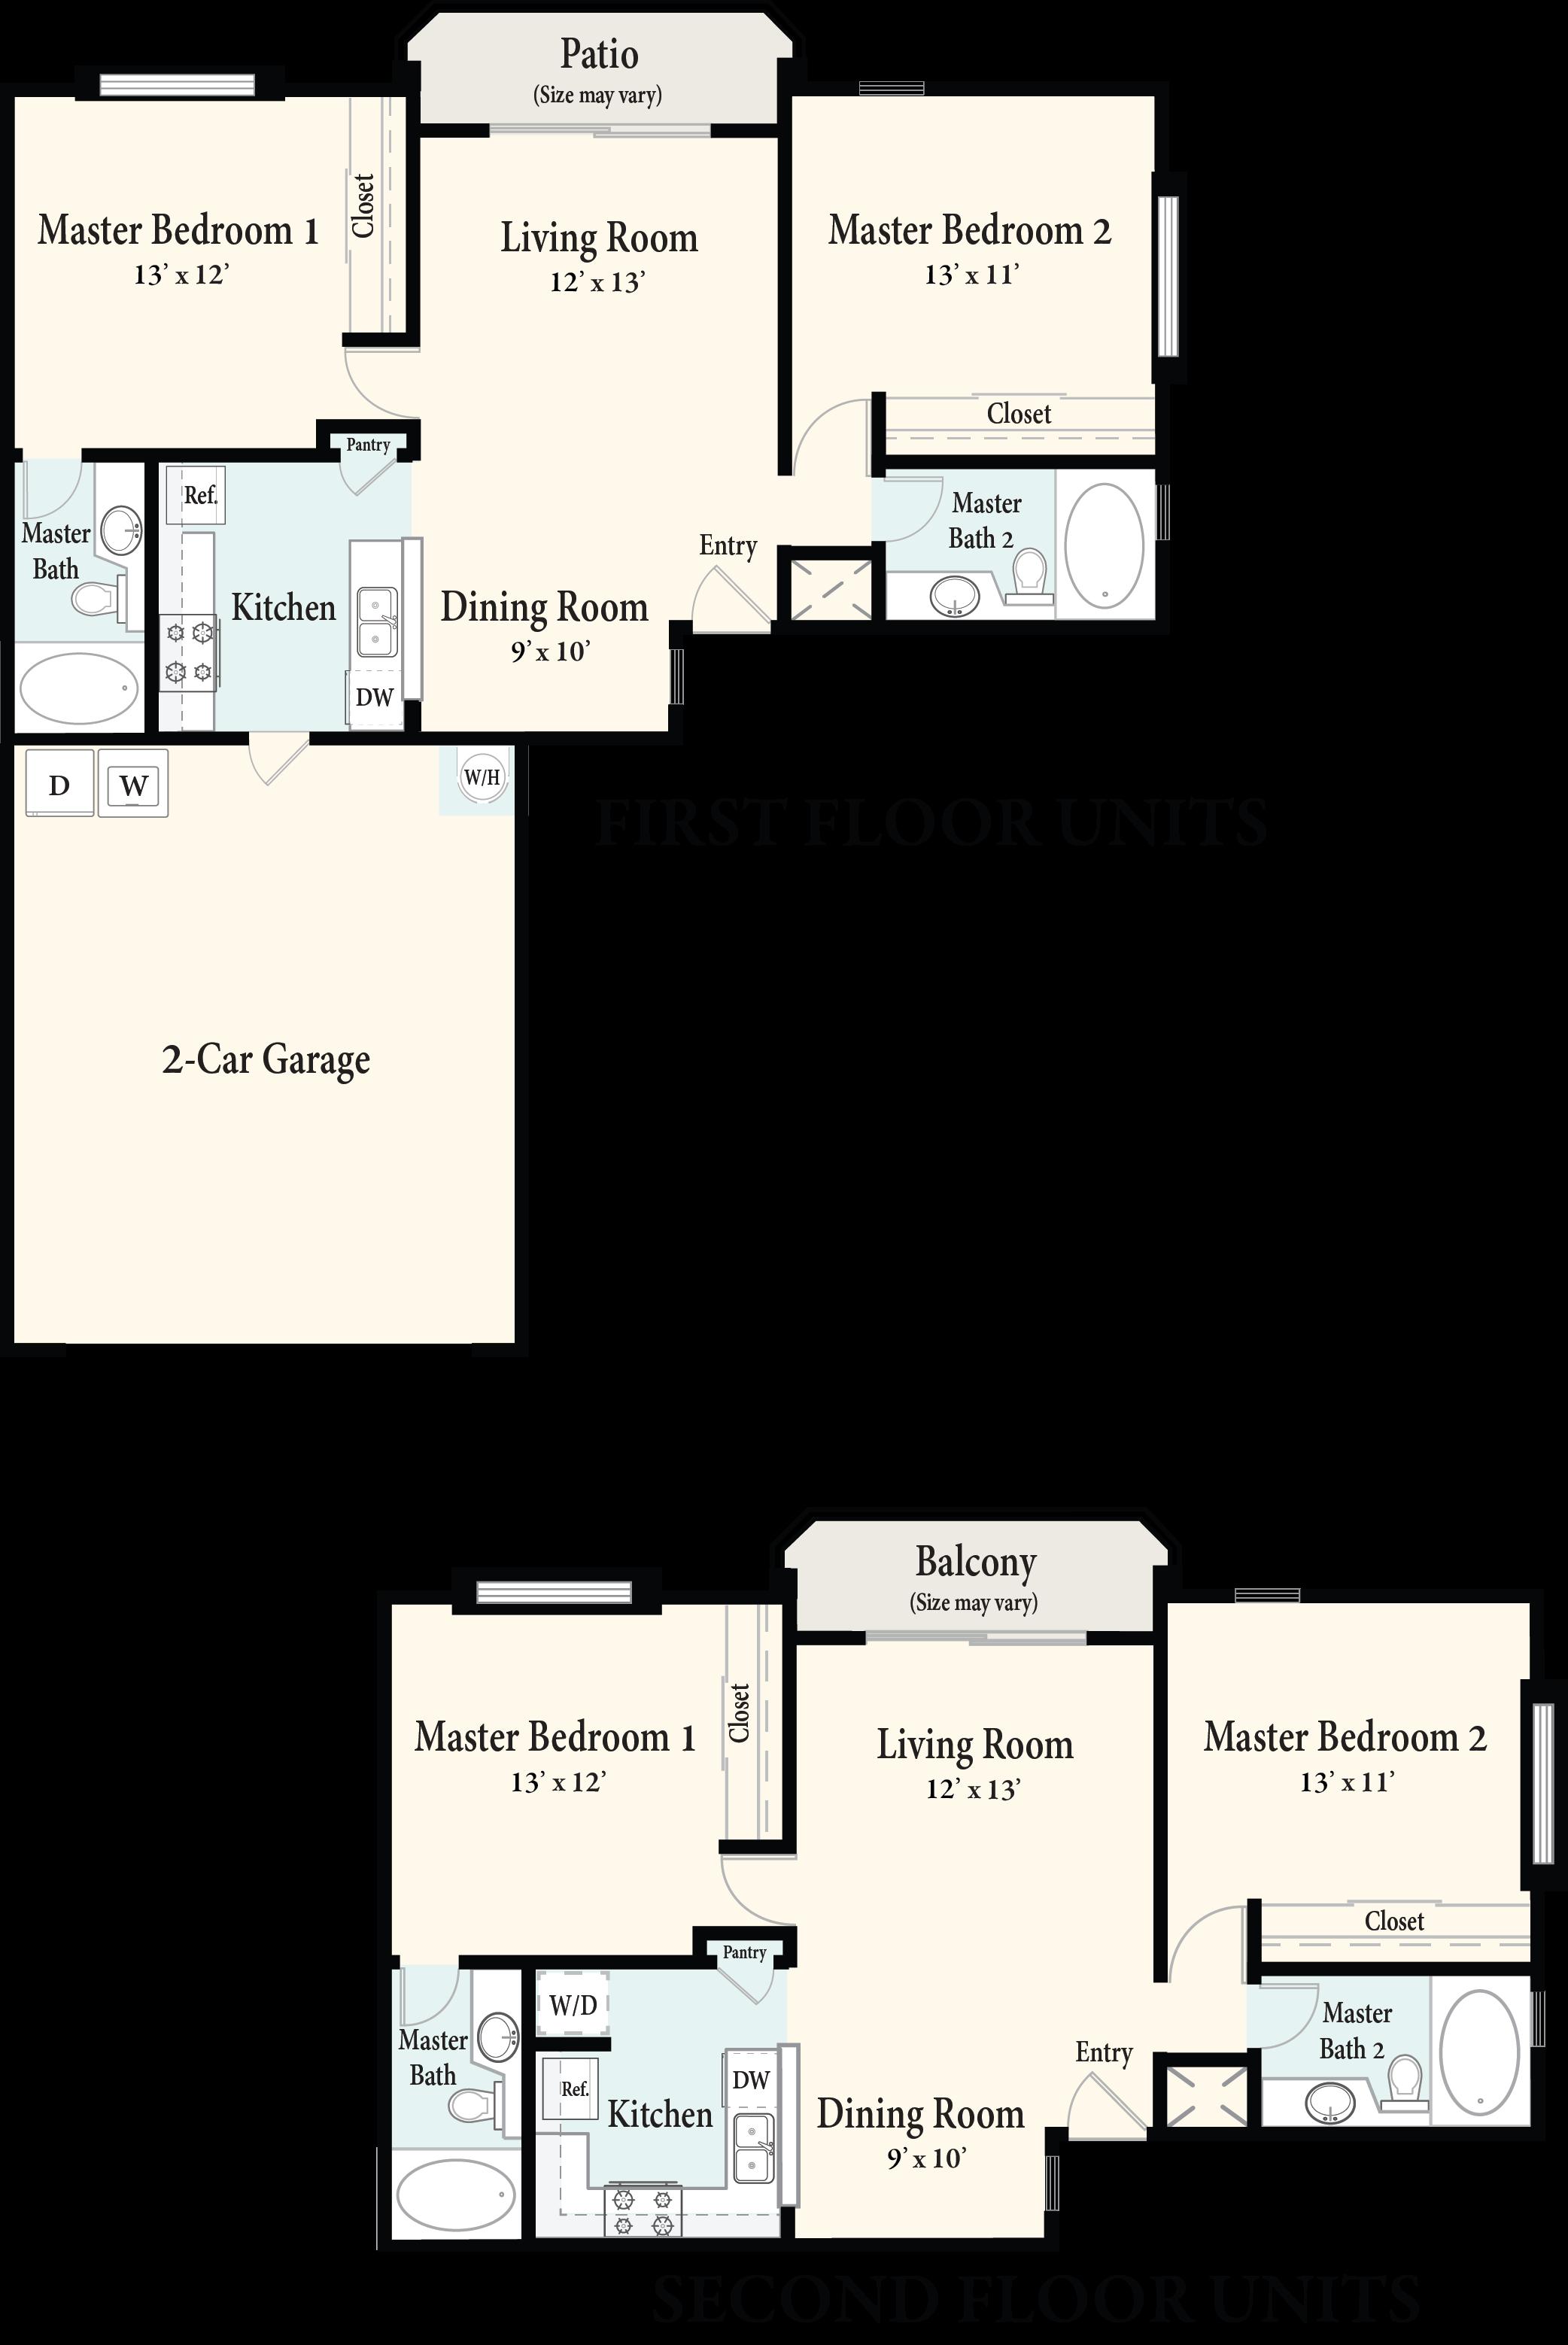 crystal cove apartments apartments for rent las vegas balboa